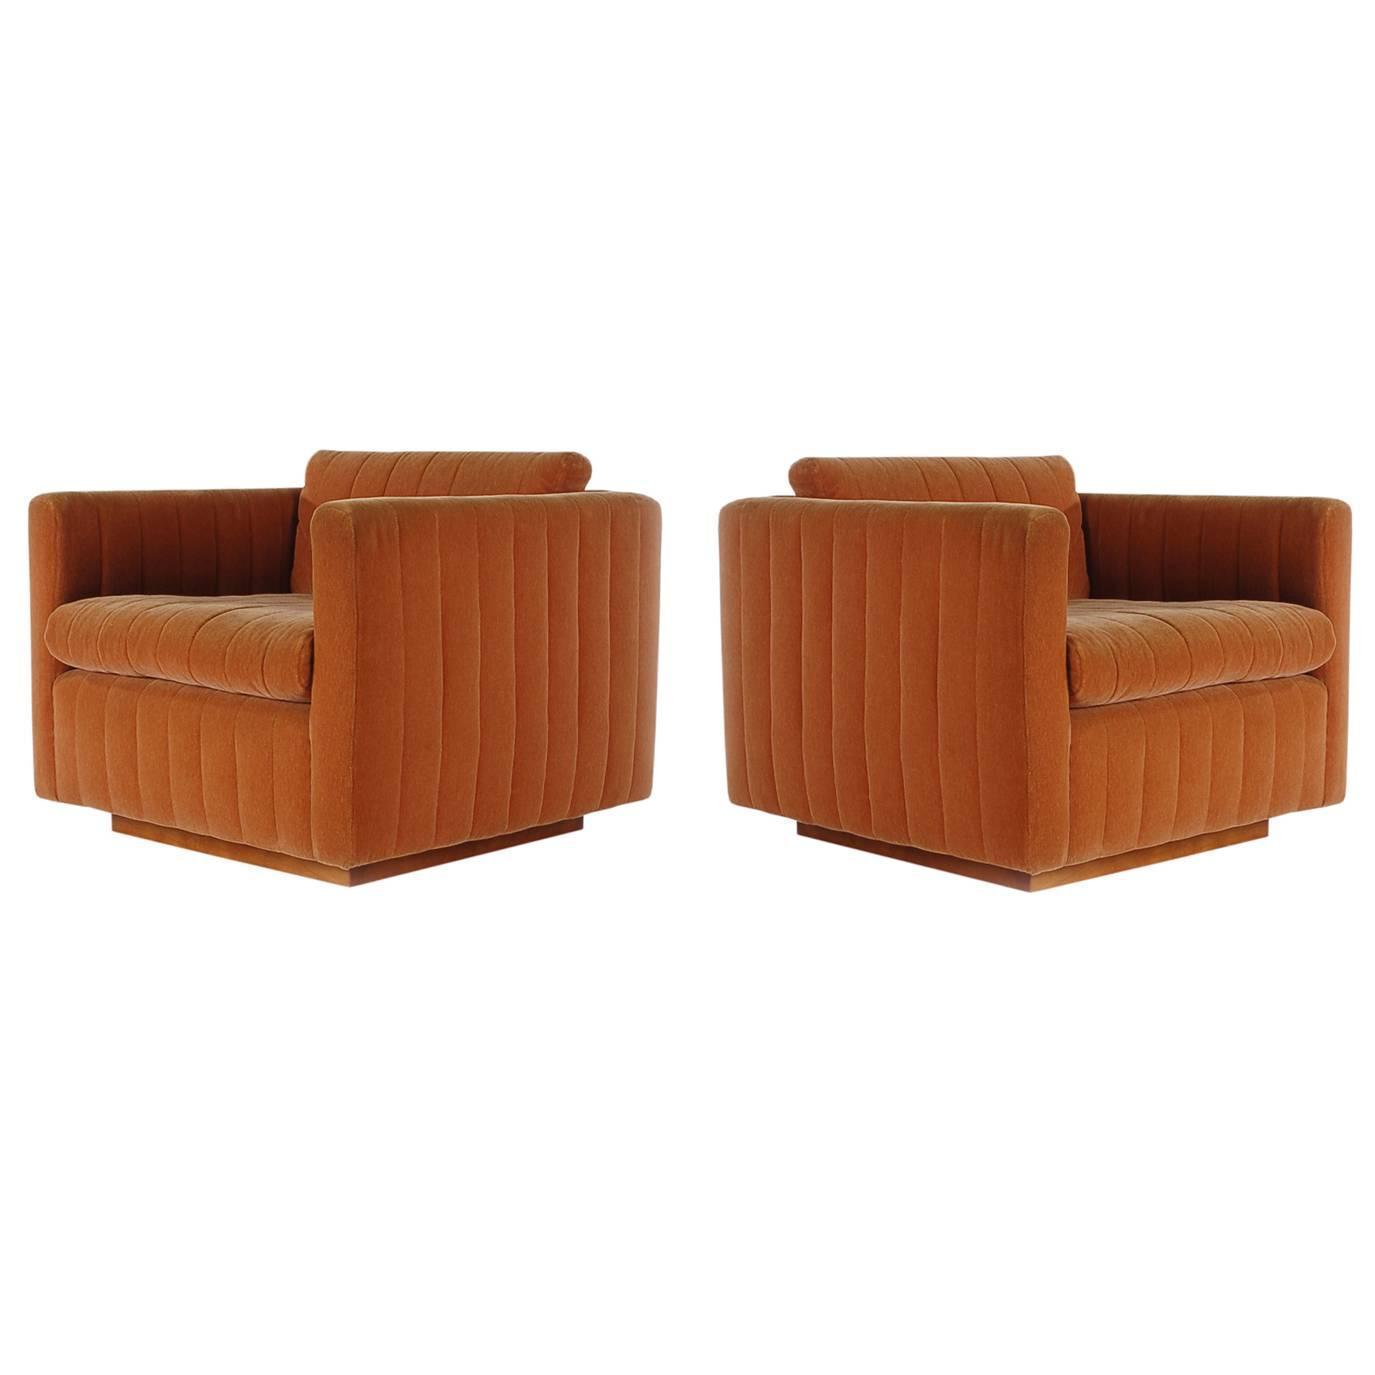 Oversized round swivel lounge chair mid century modern at 1stdibs - Mid Century Modern Milo Baughman Art Deco Cube Club Lounge Chairs